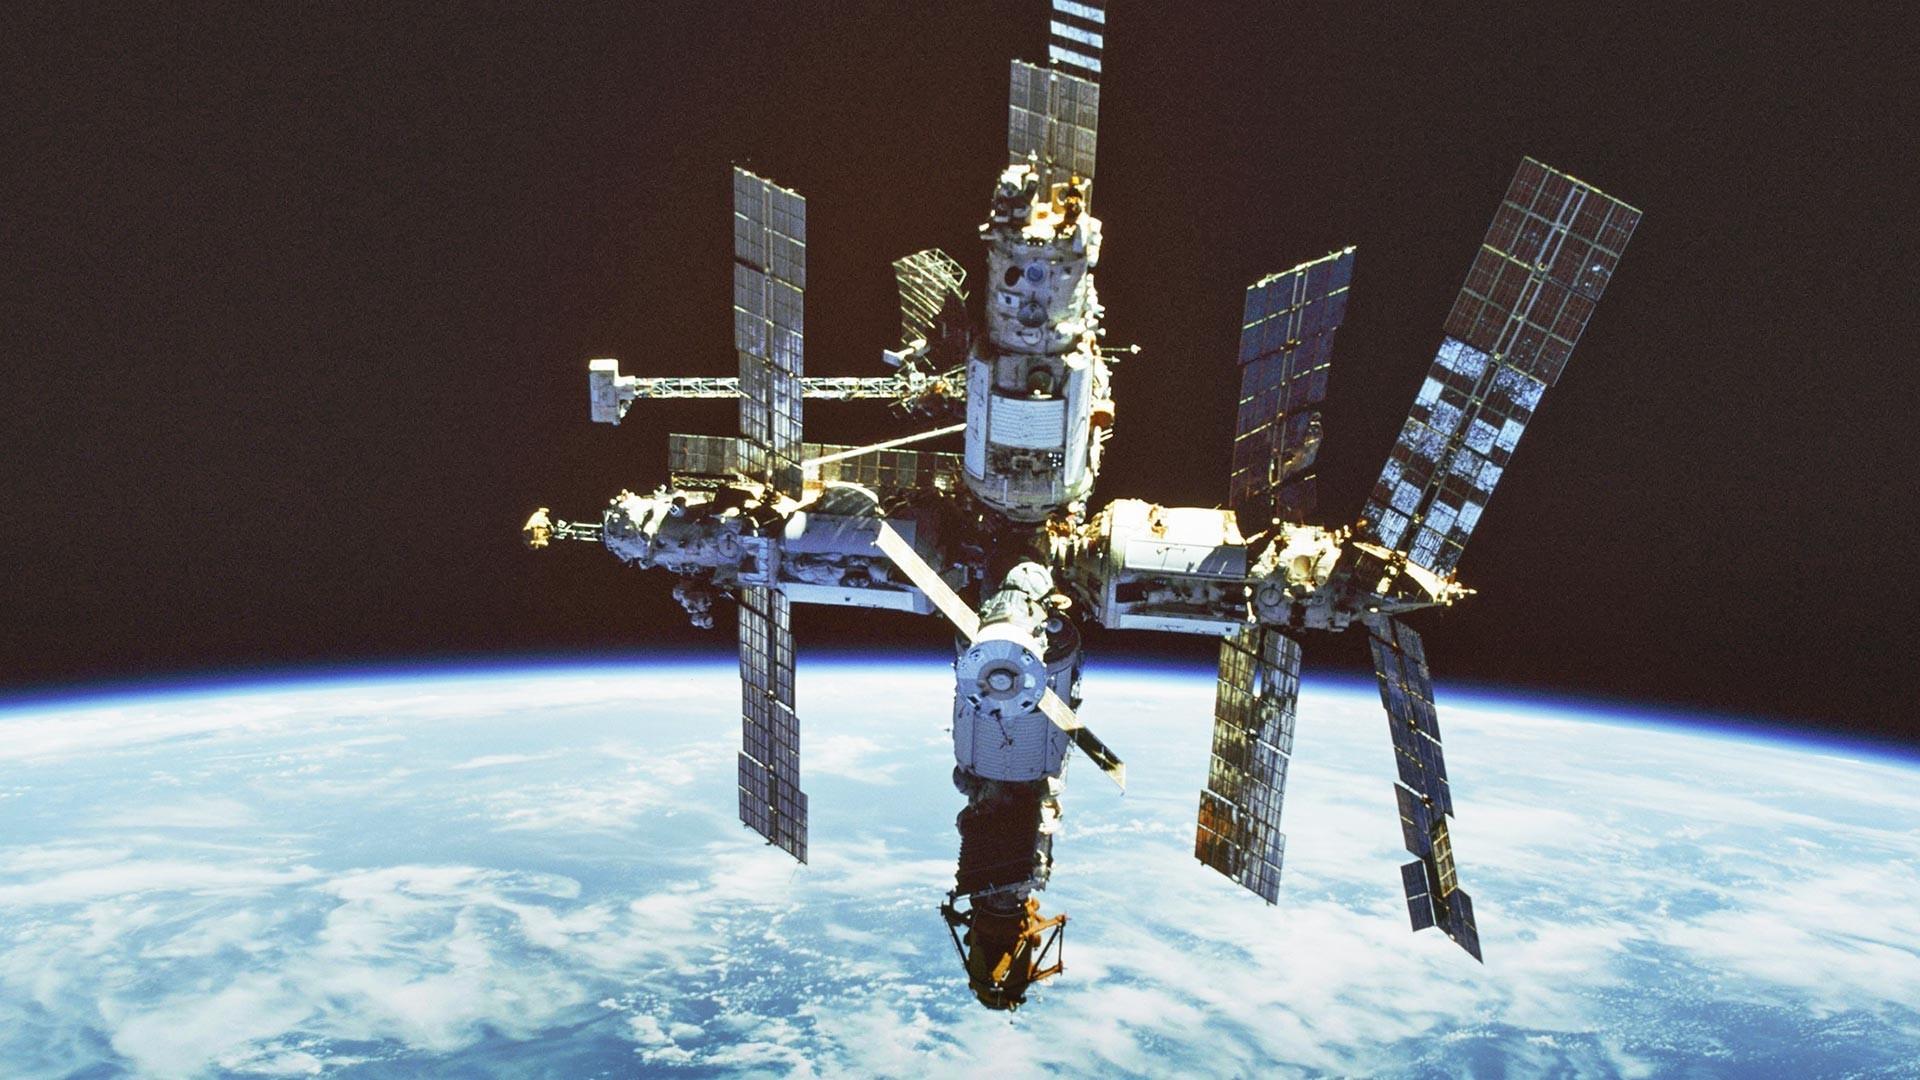 Il complesso orbitale Mir